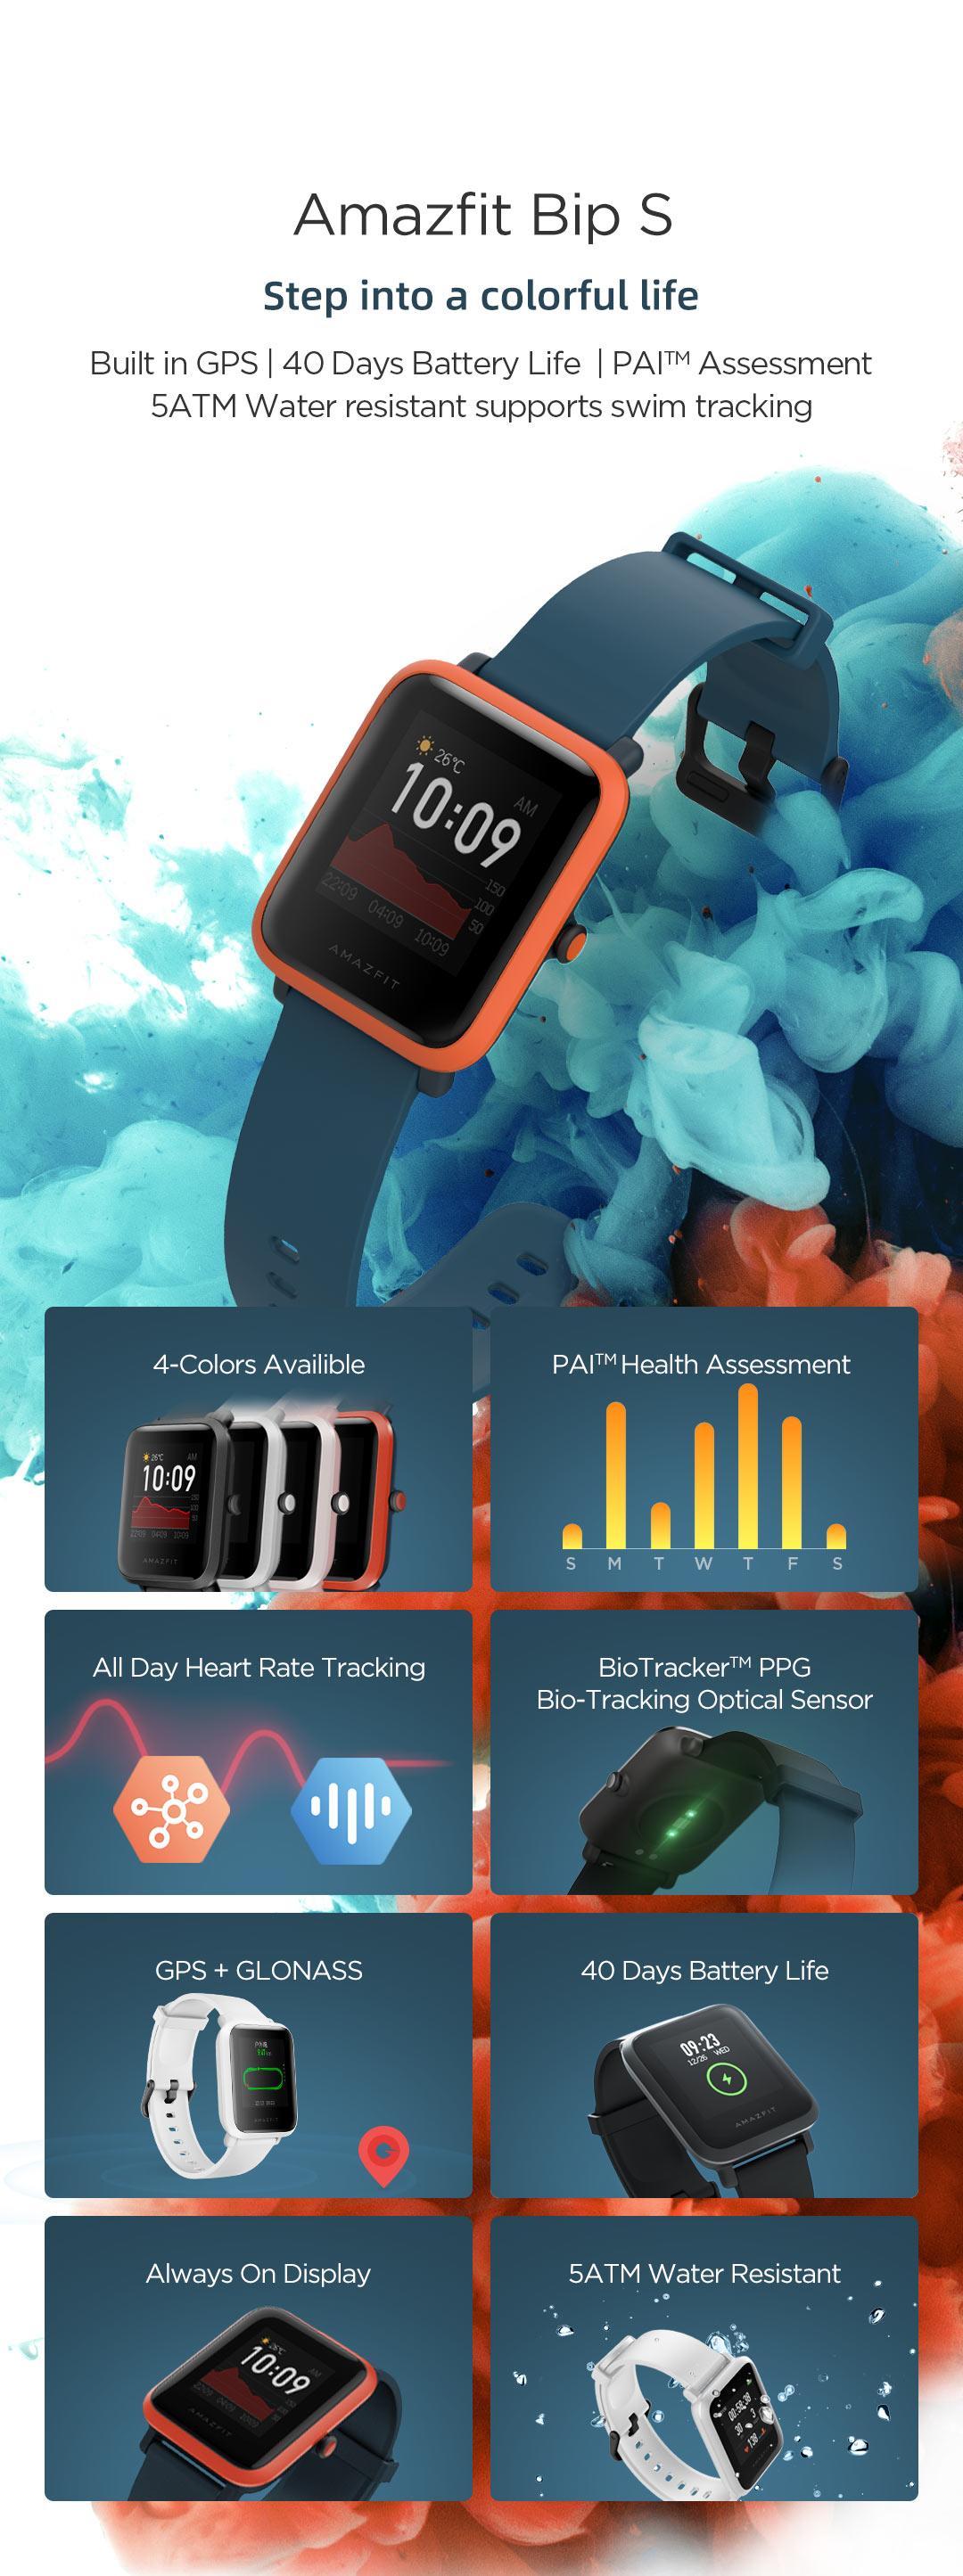 Hab94fdd3a8b74256ad3df06e5a1a6b98A In Stock 2020 Global Amazfit Bip S Smartwatch 5ATM waterproof built in GPS GLONASS Smart Watch for Android iOS Phone